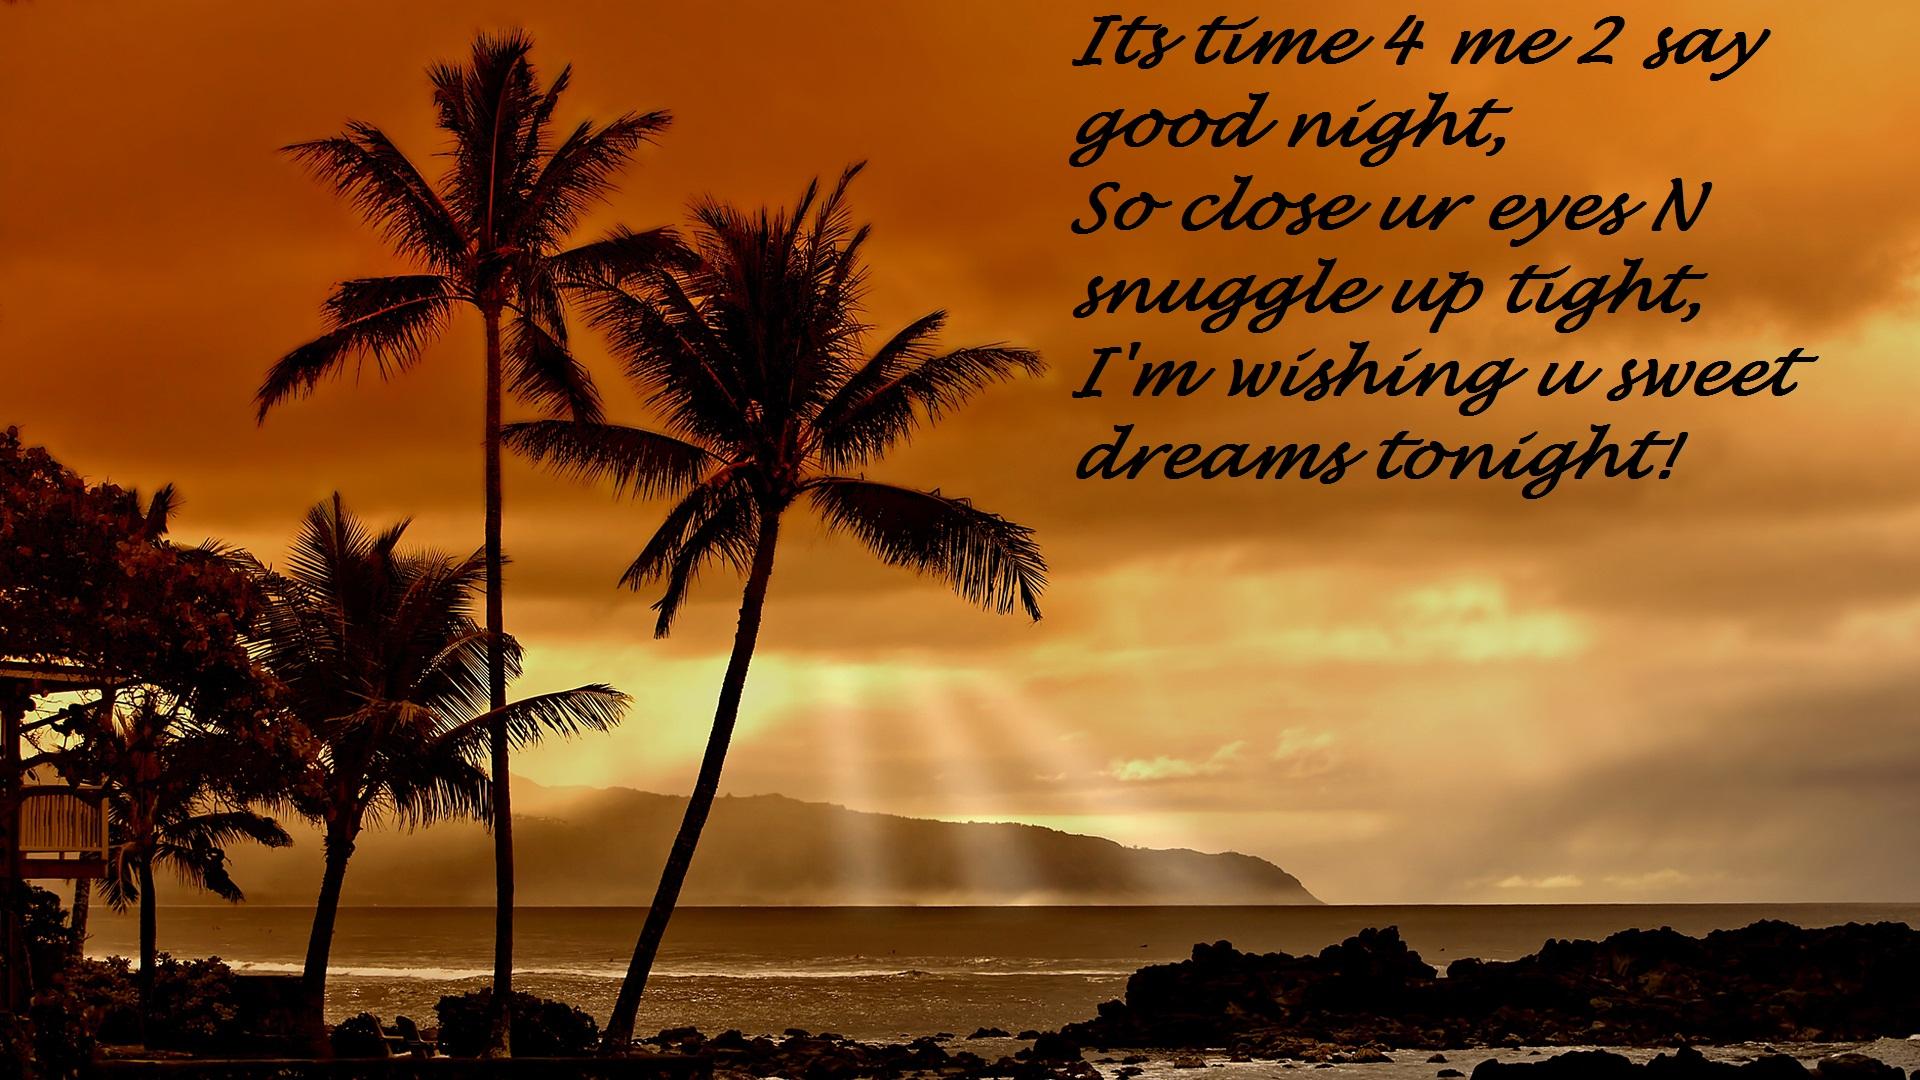 Good Night Quote Wallpaper - Good Night Hd Quotes - HD Wallpaper